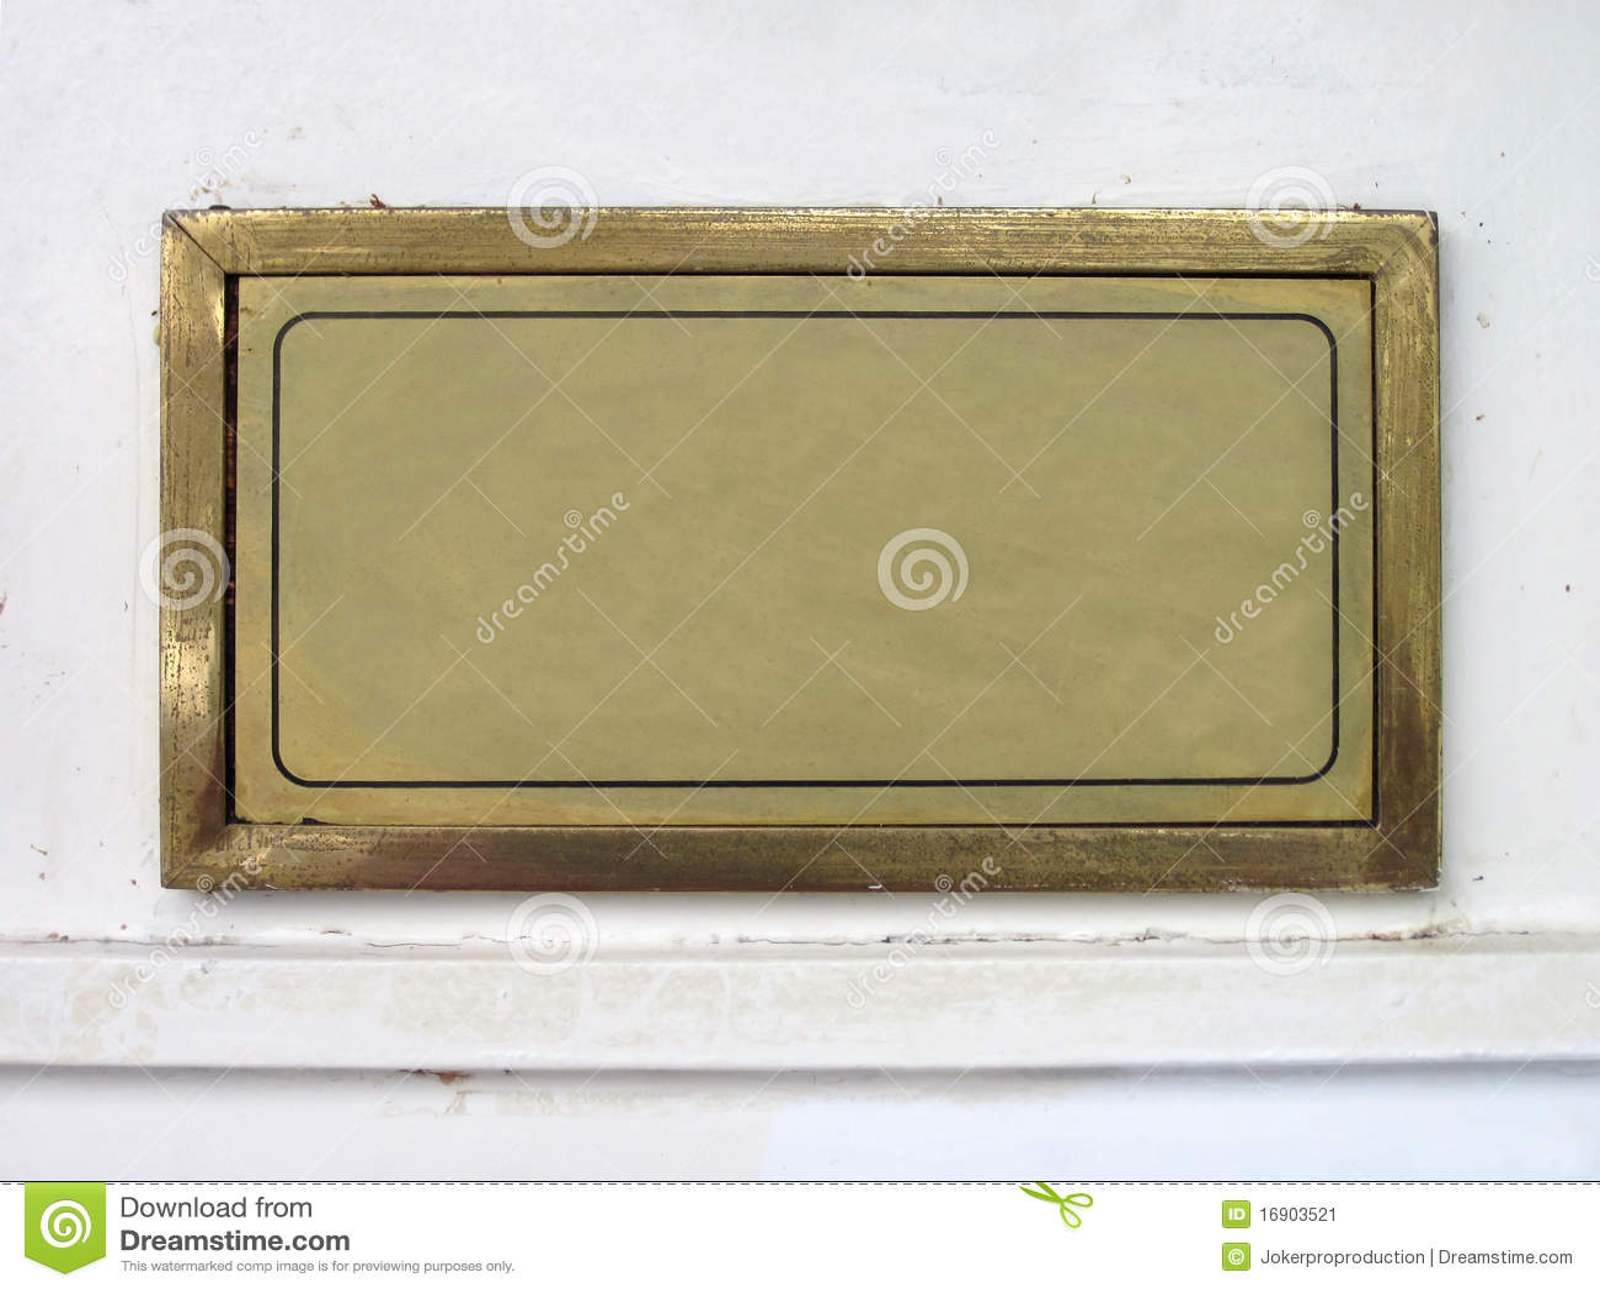 Download Nameplate stock image. Image of rectangular, design, facia - 16903521